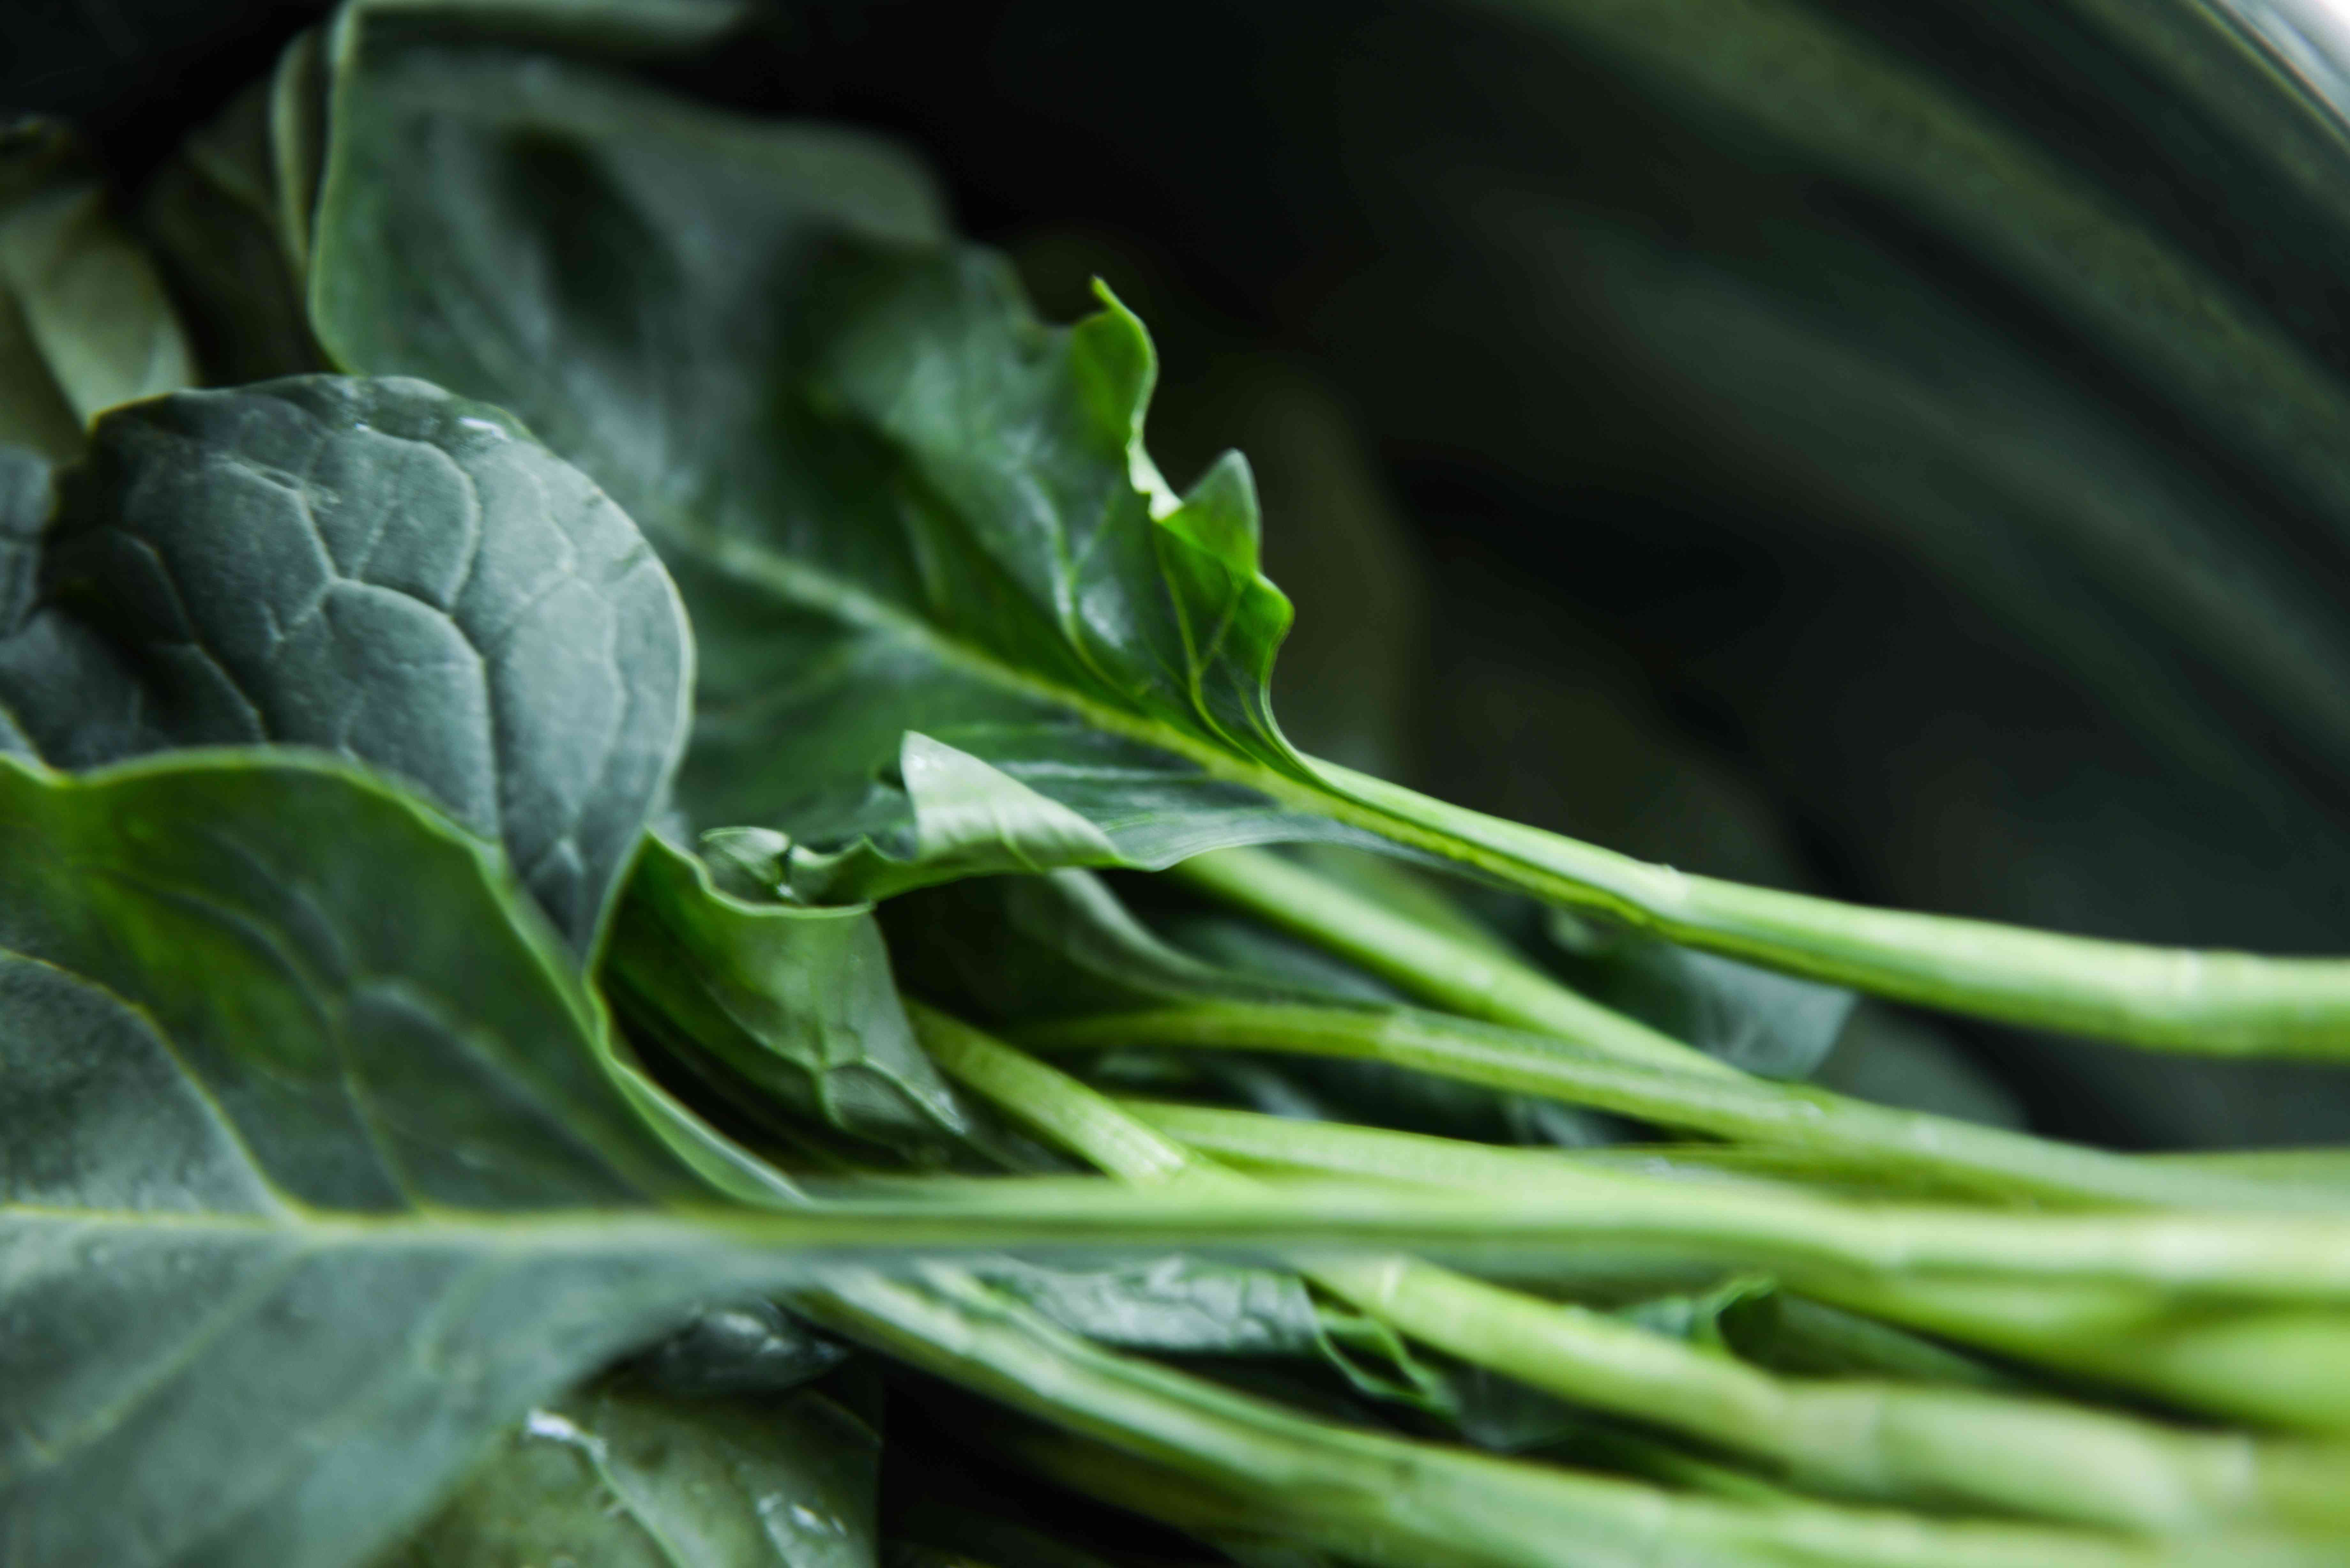 Close up of fresh greens.